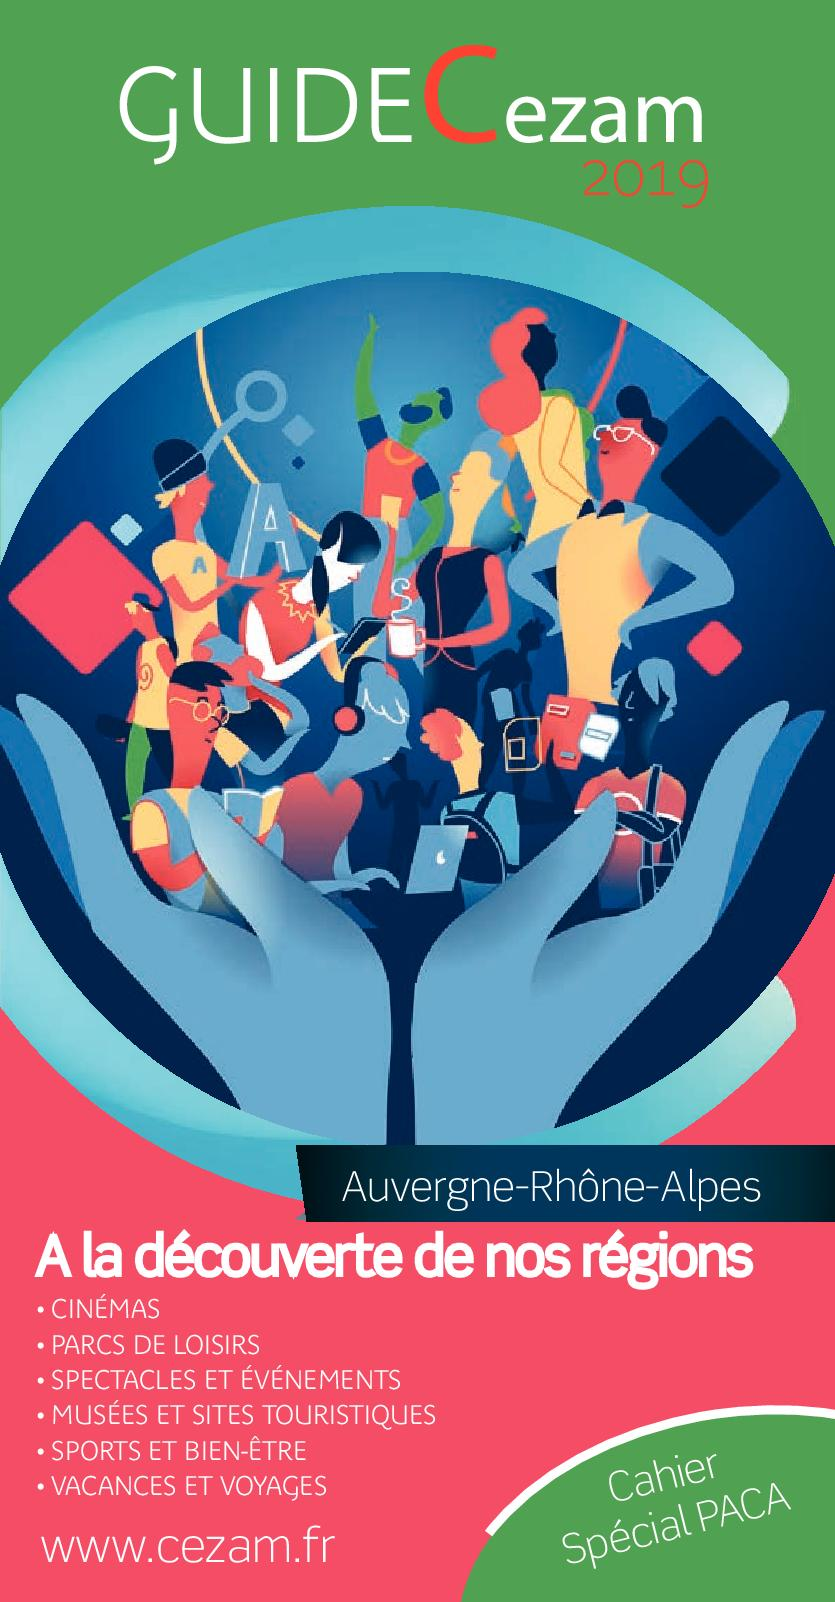 Carte Cezam Leclerc Voyages.Calameo Guide Cezam Auvergne Rhone Alpe 2019